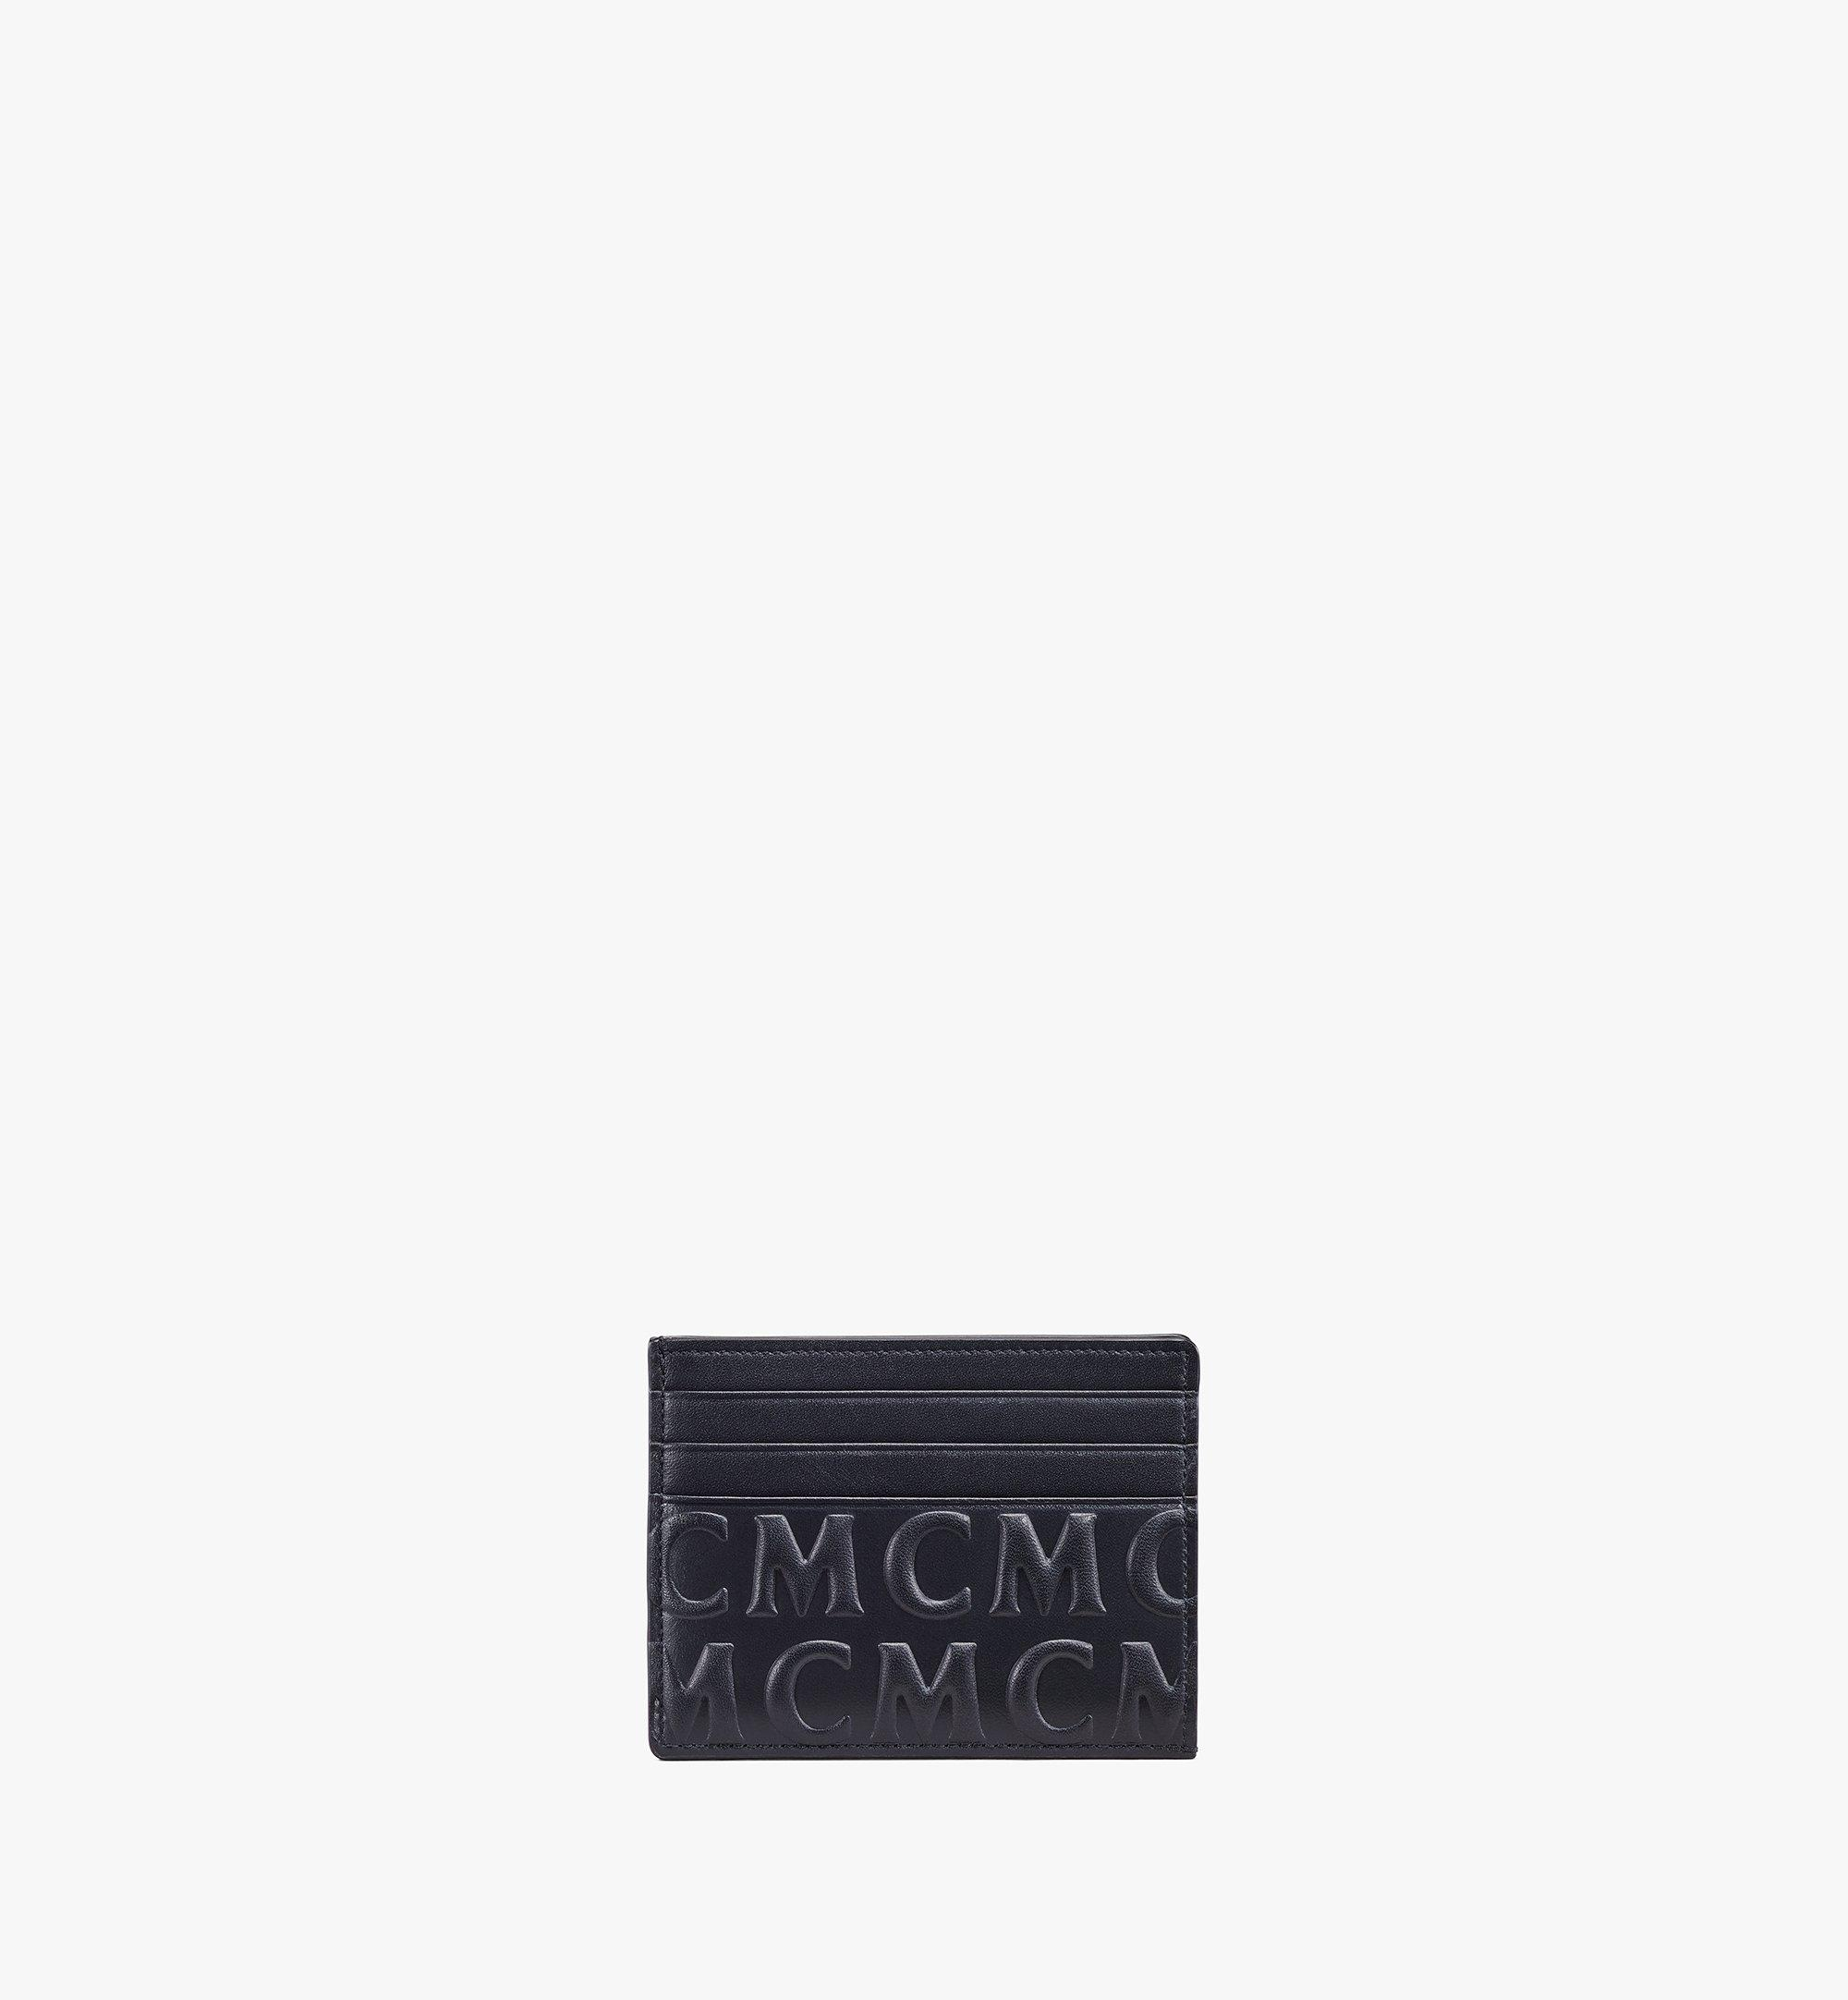 MCM Card Case in MCM Monogram Leather Black MXAAAMD01BK001 Alternate View 1